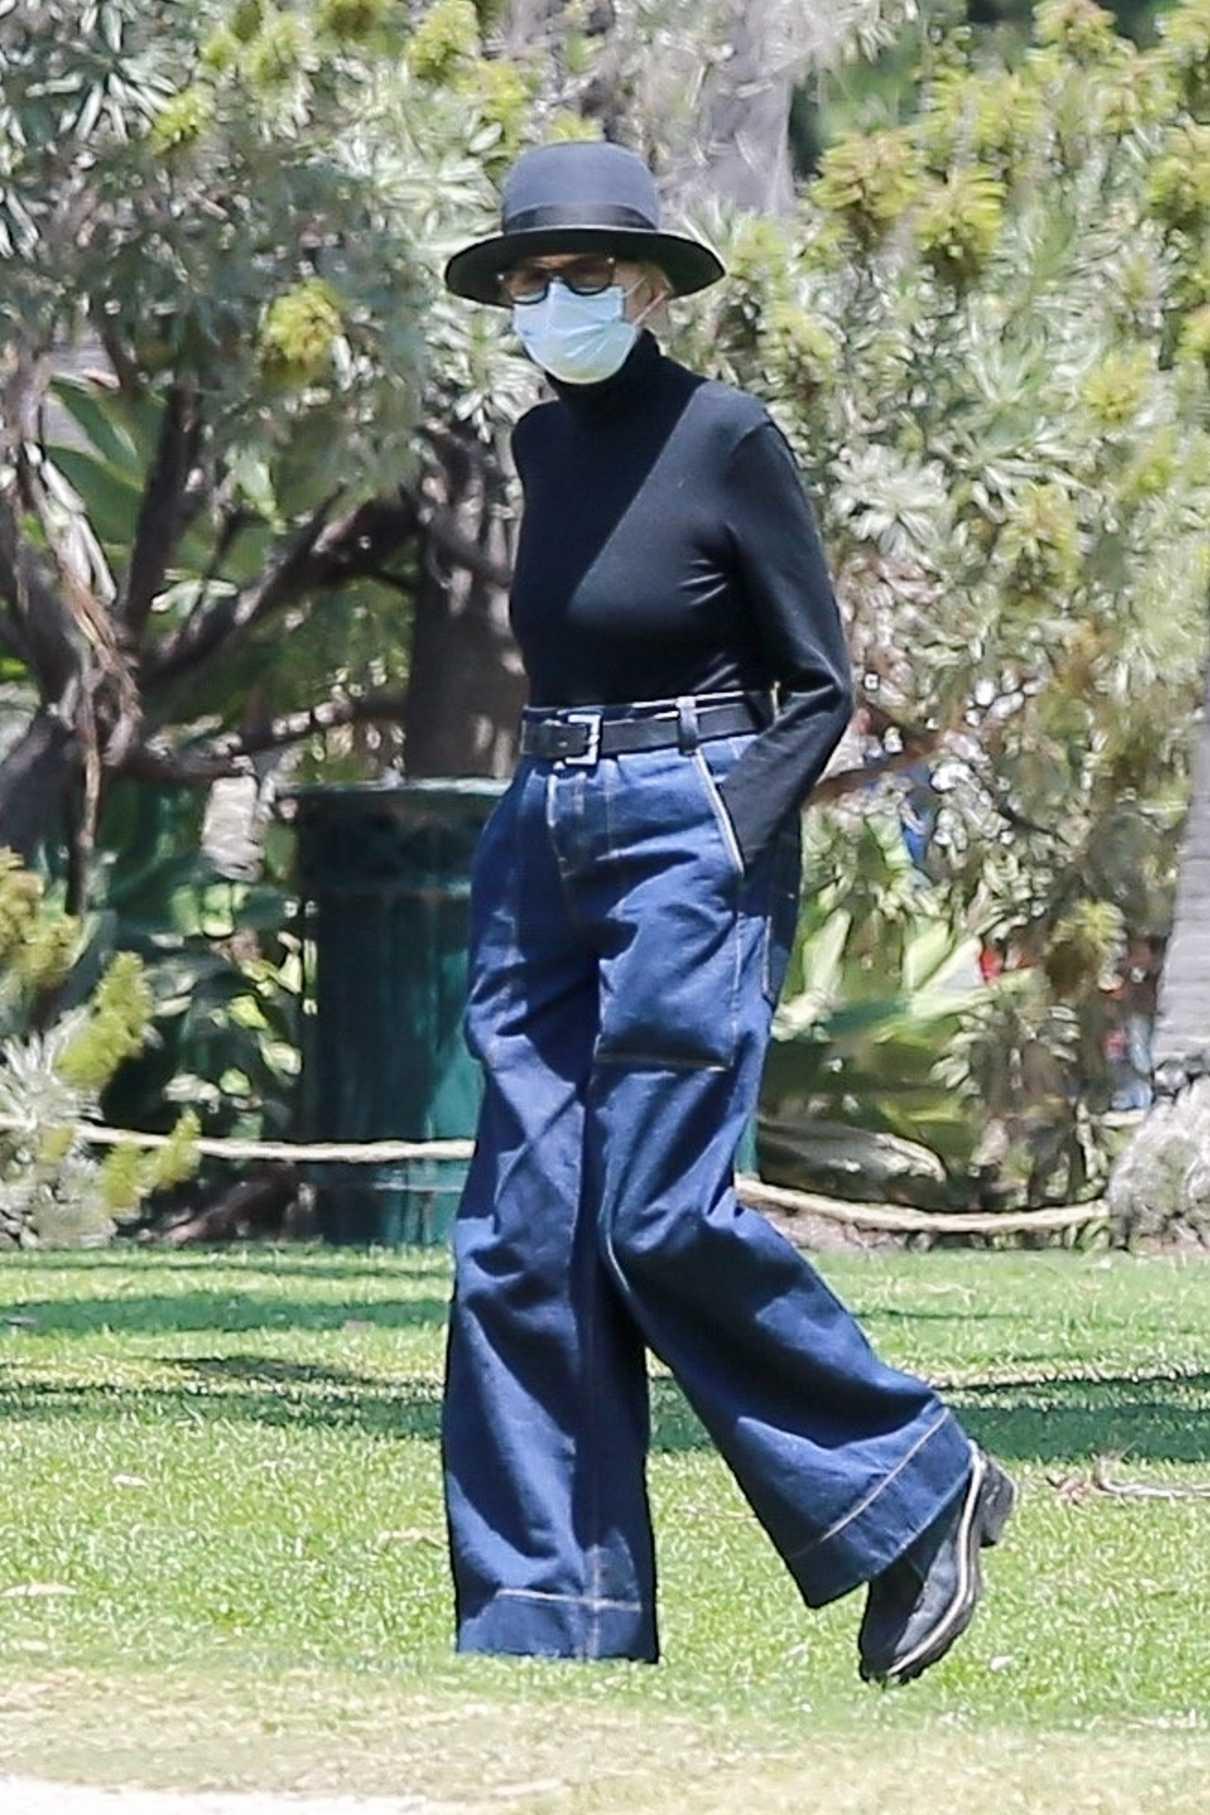 Diane Keaton in a Black Bowler